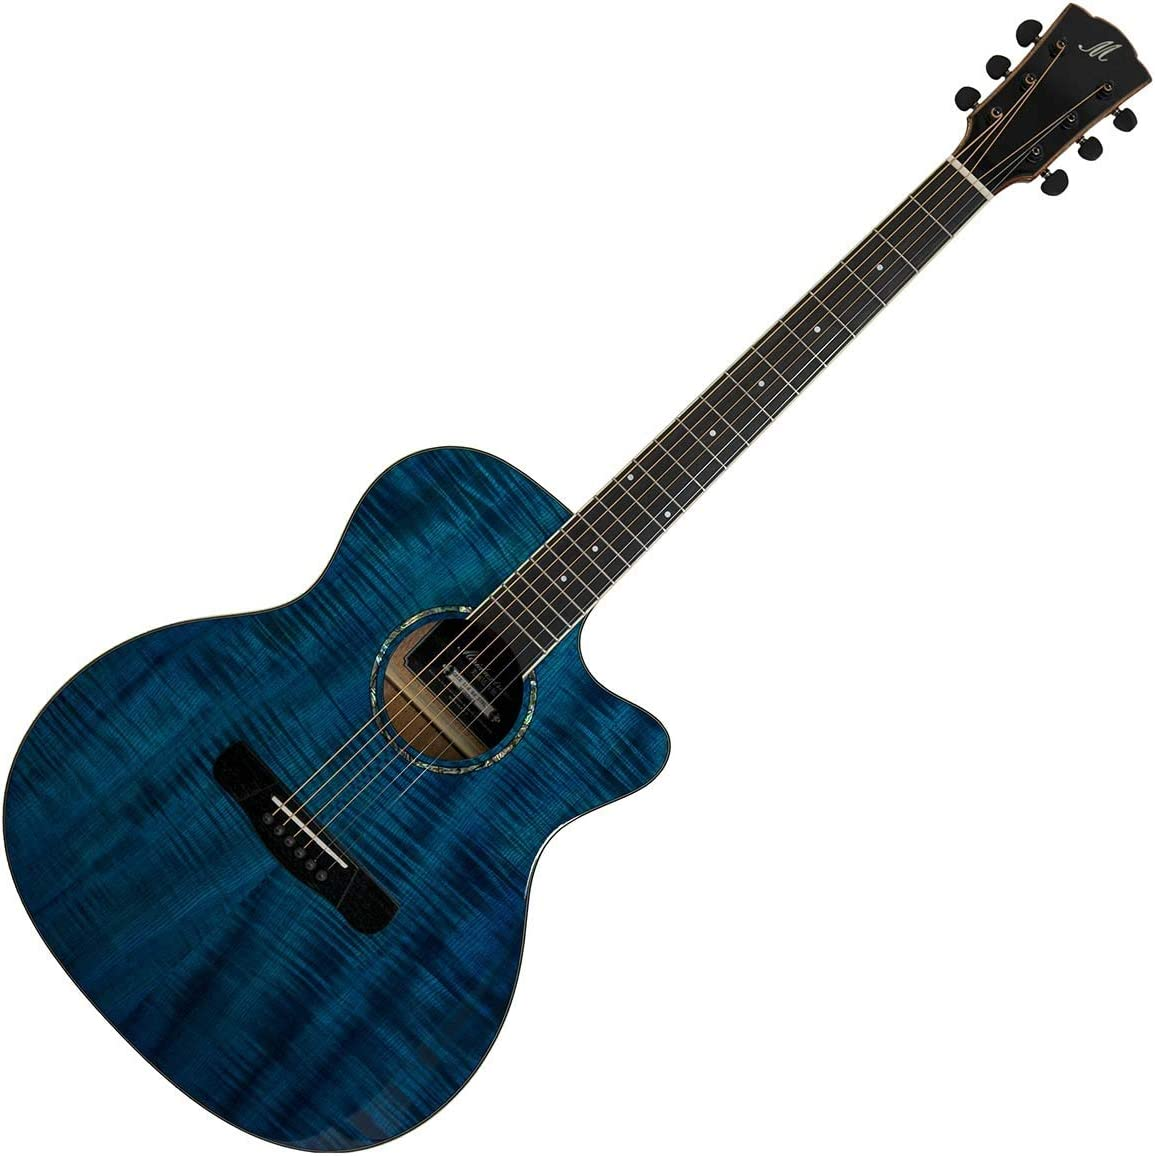 Merida Extrema GACE Ltd. Ed. - Guitarra electroacústica, color azul